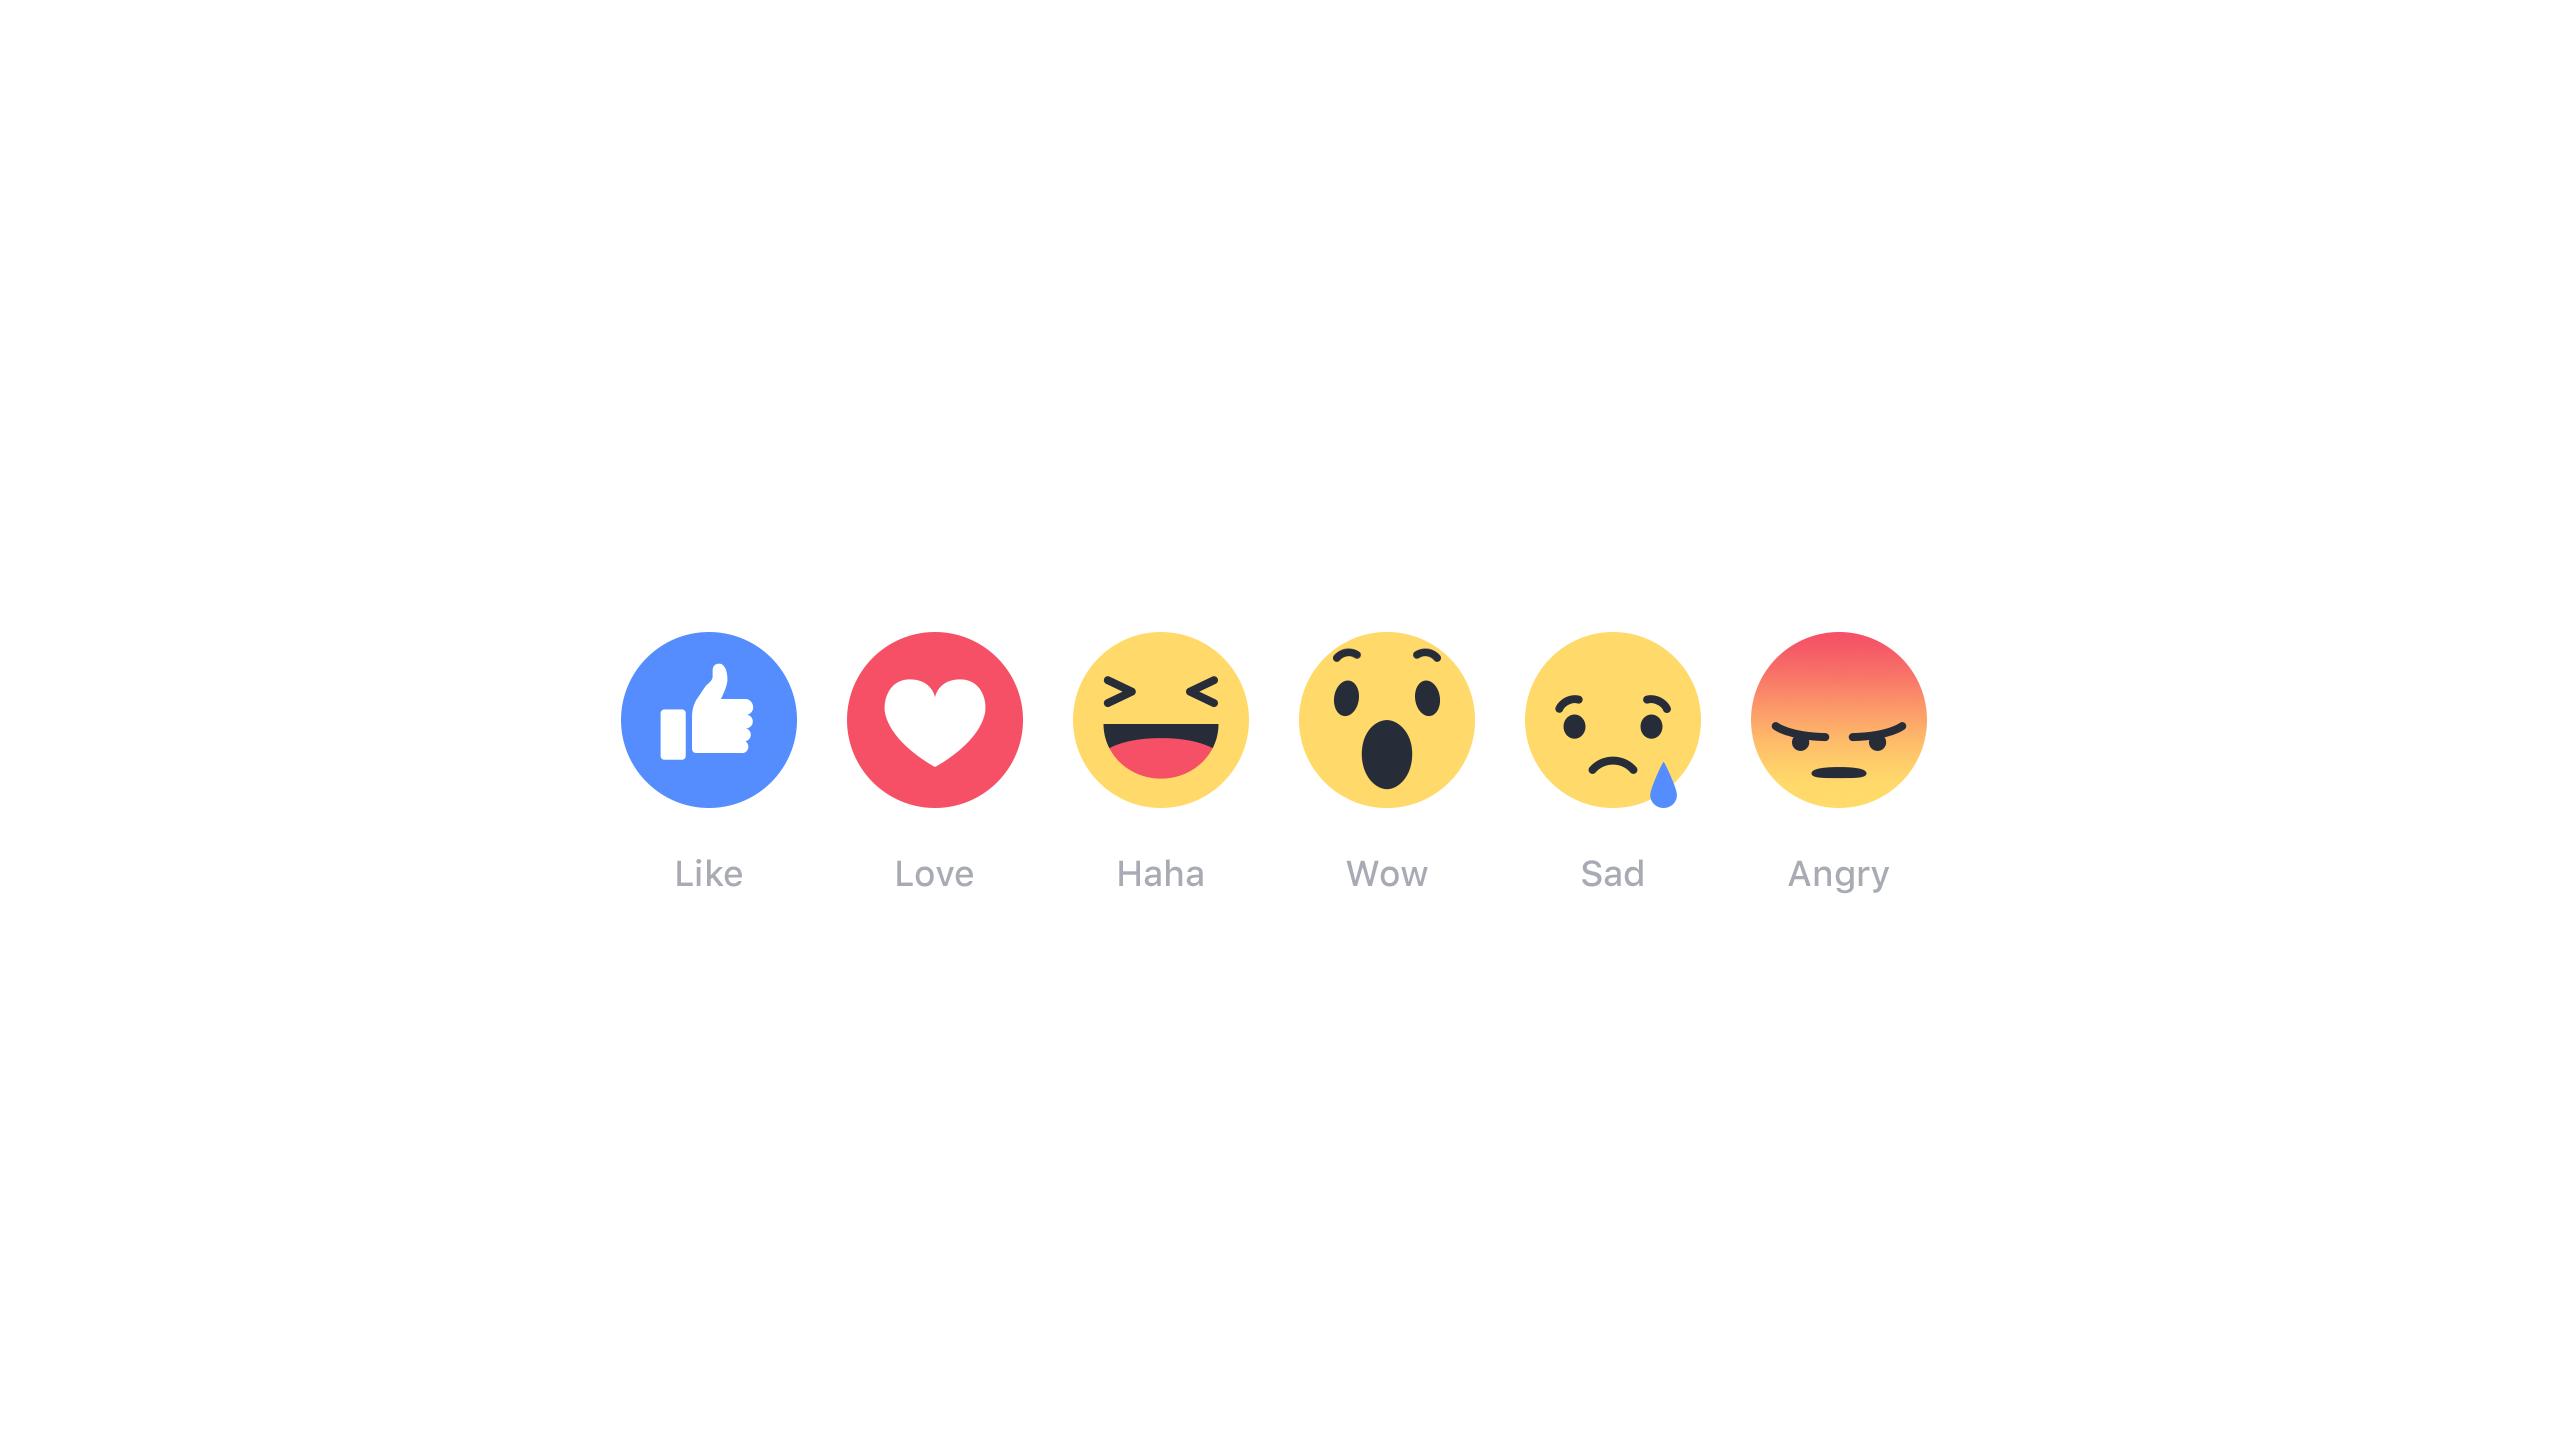 Meet Facebooks New Emoting Emojis Love Haha Wow Sad And Angry